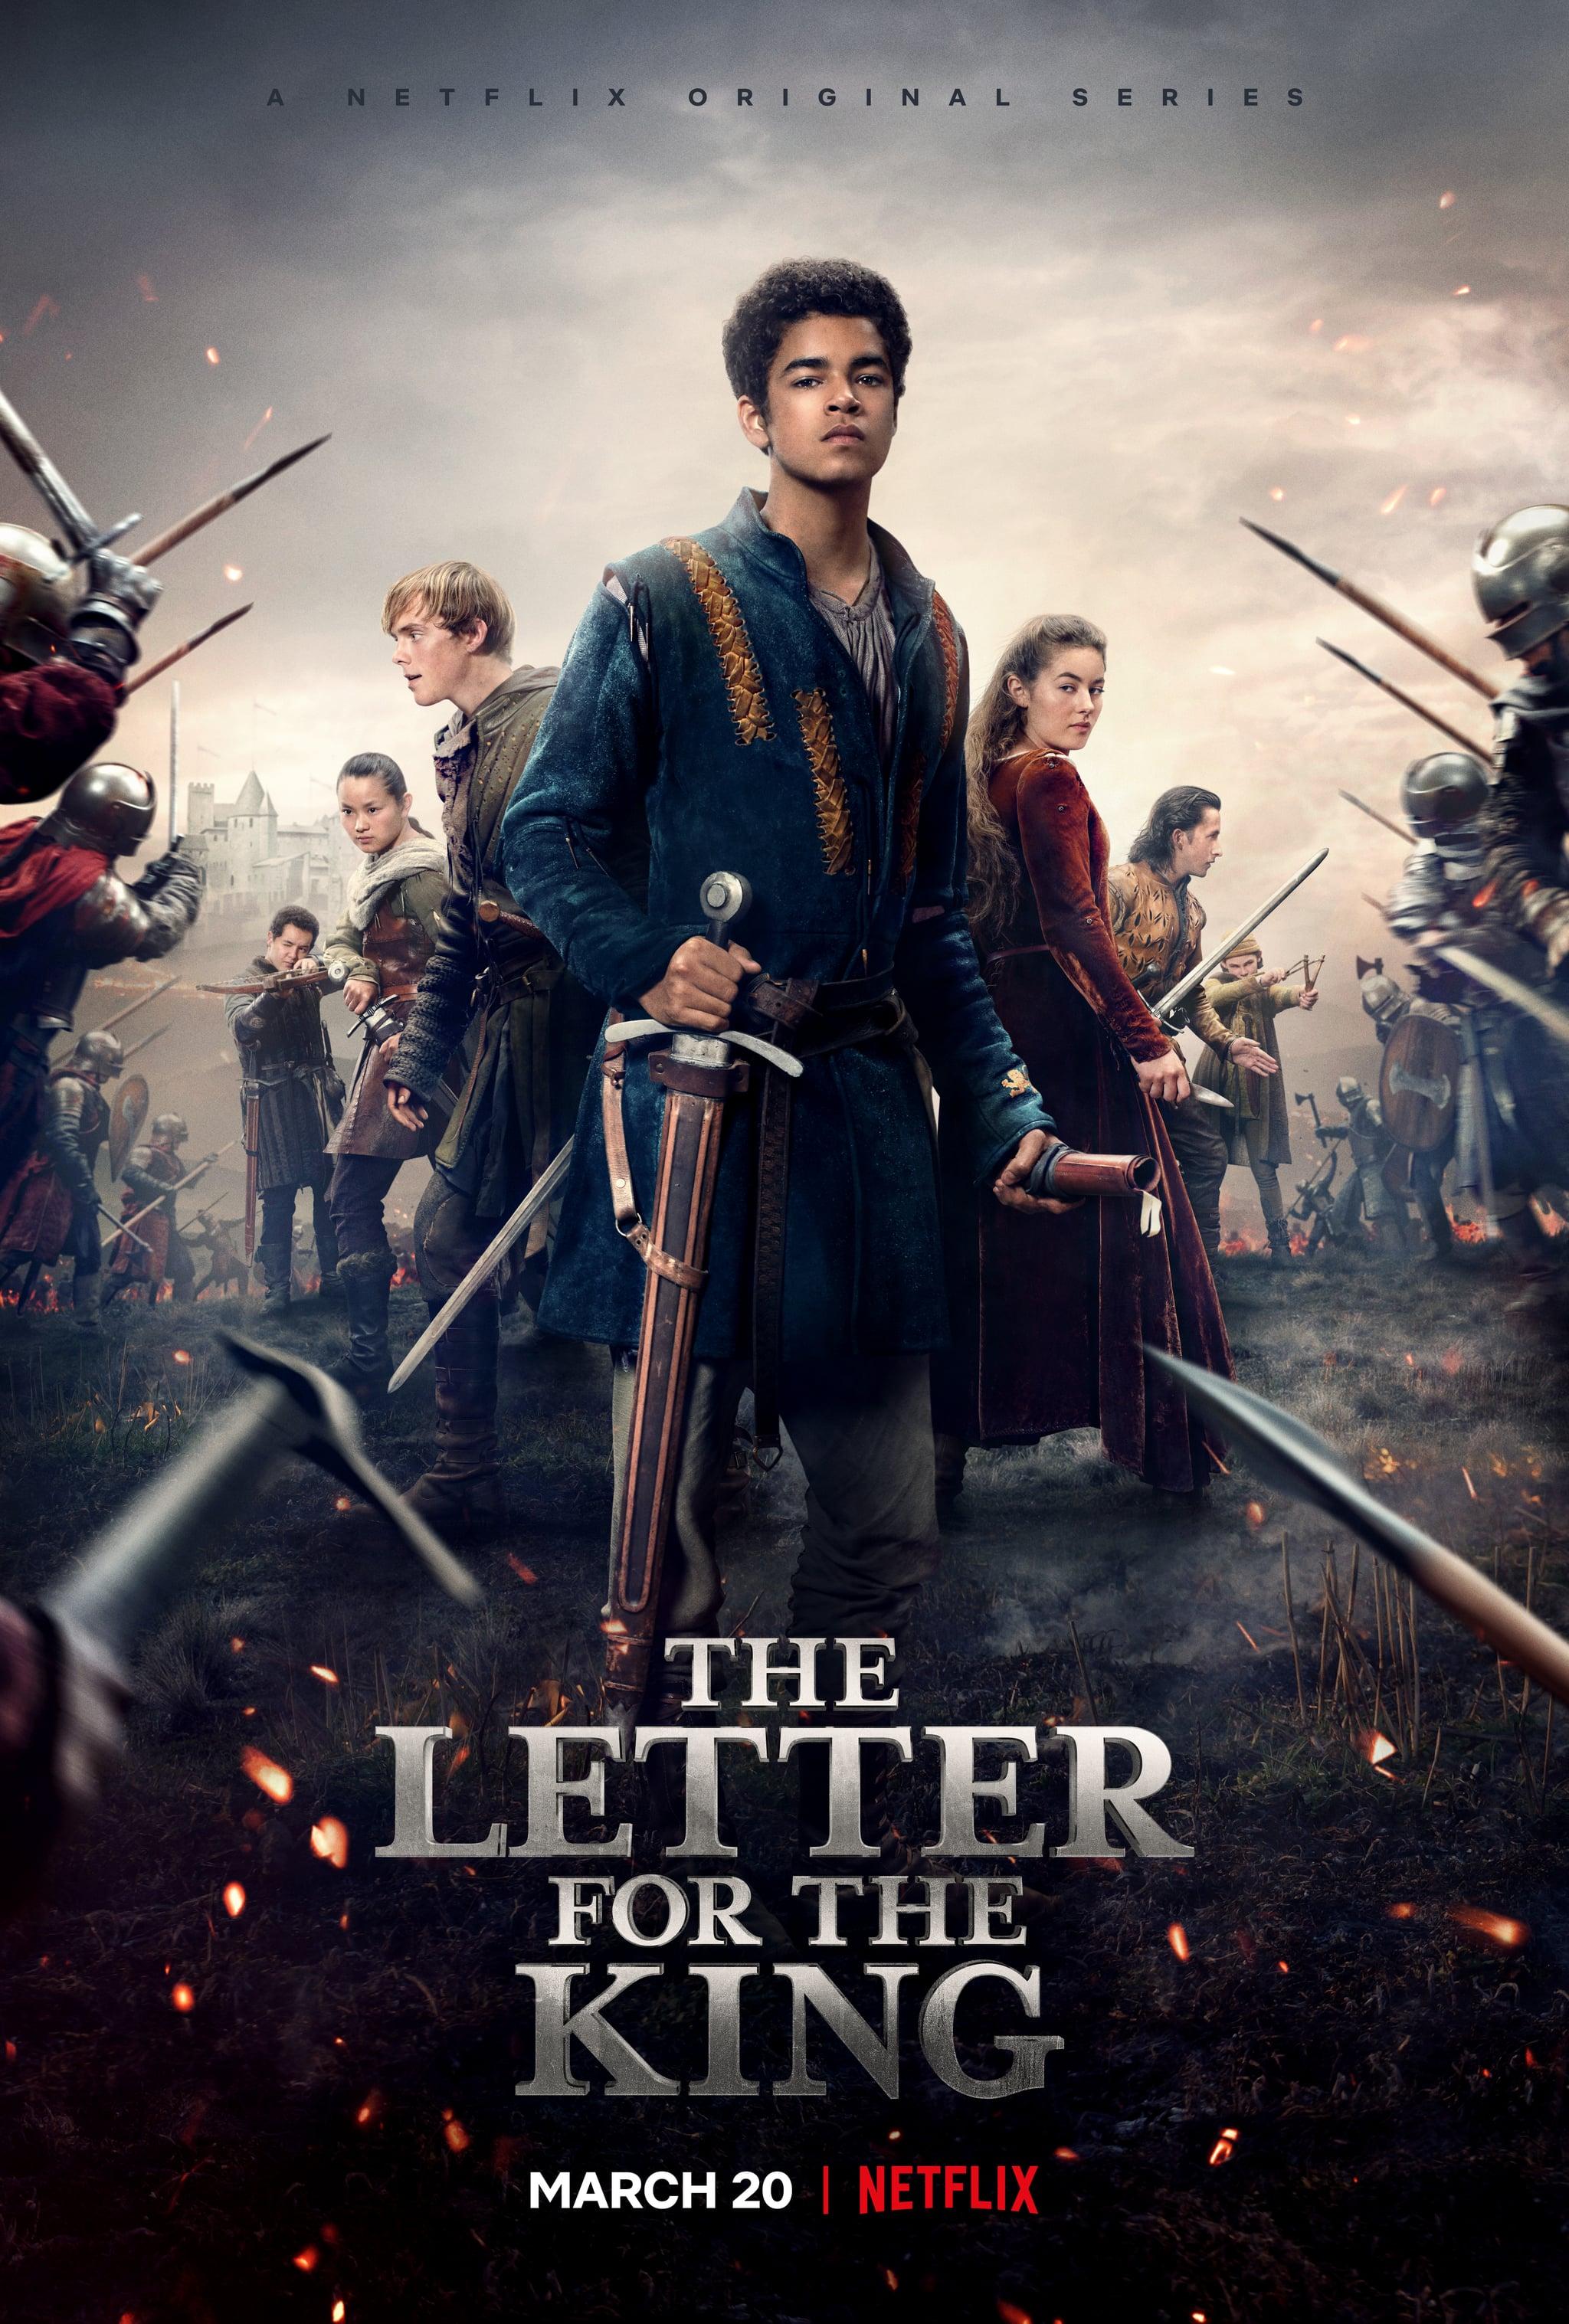 Netflix-Letter-For-King-Promotional-Poster